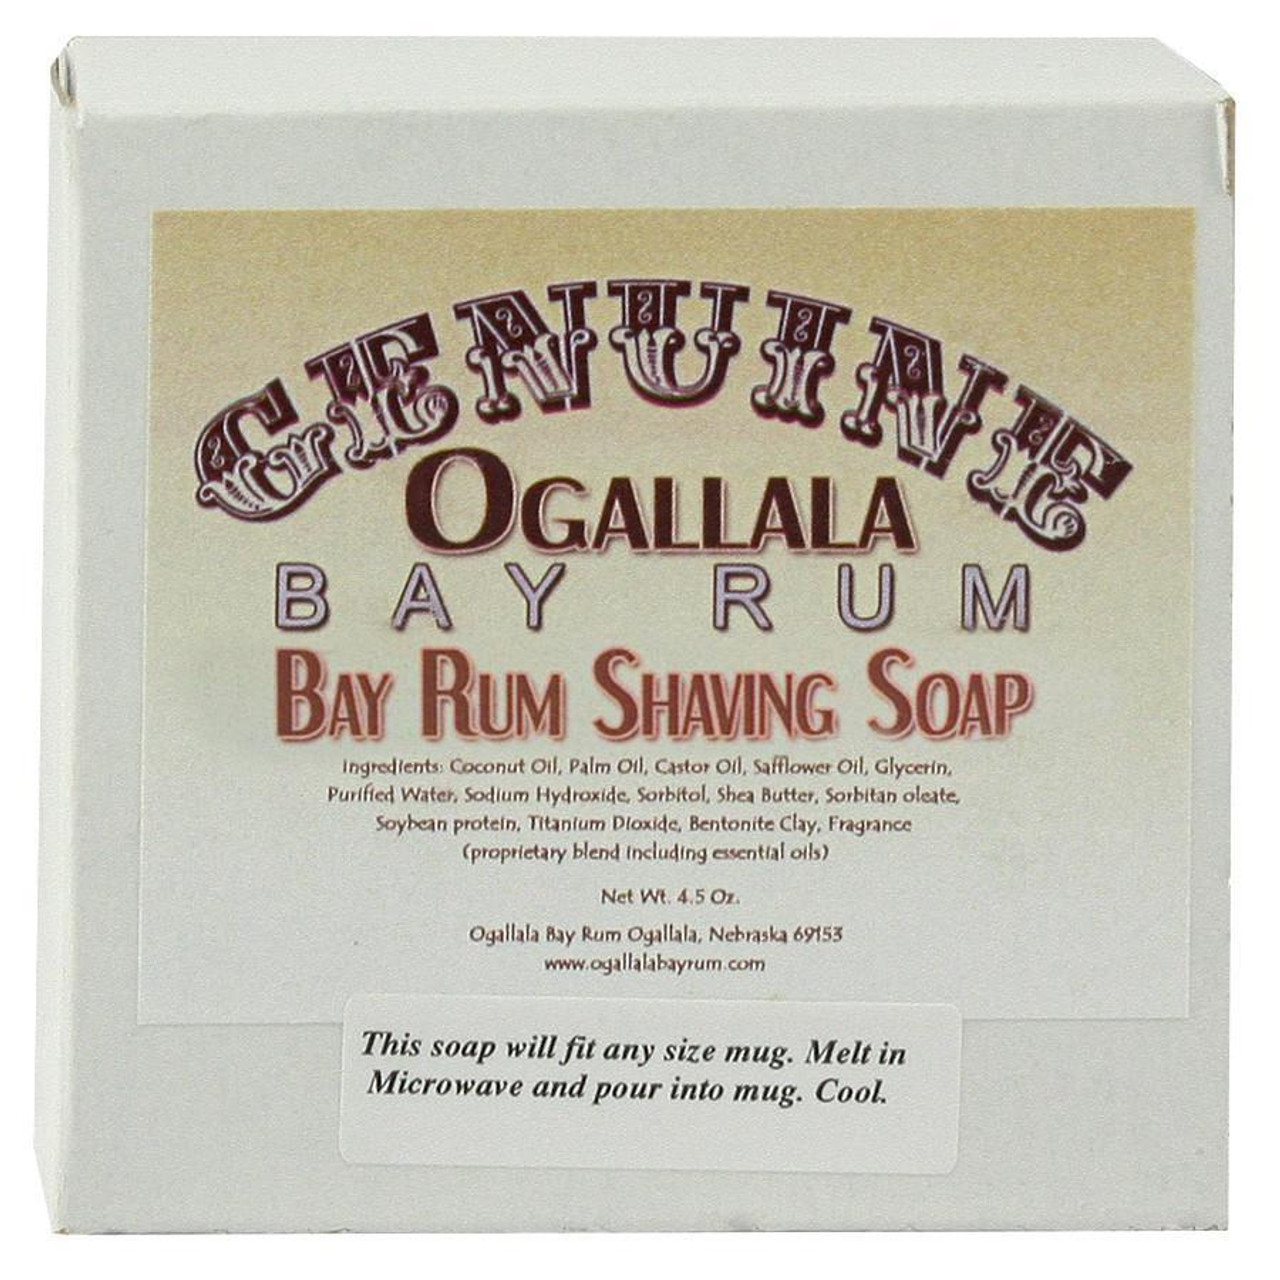 Ogallala Bay Rum Shave Soap, 4.5oz